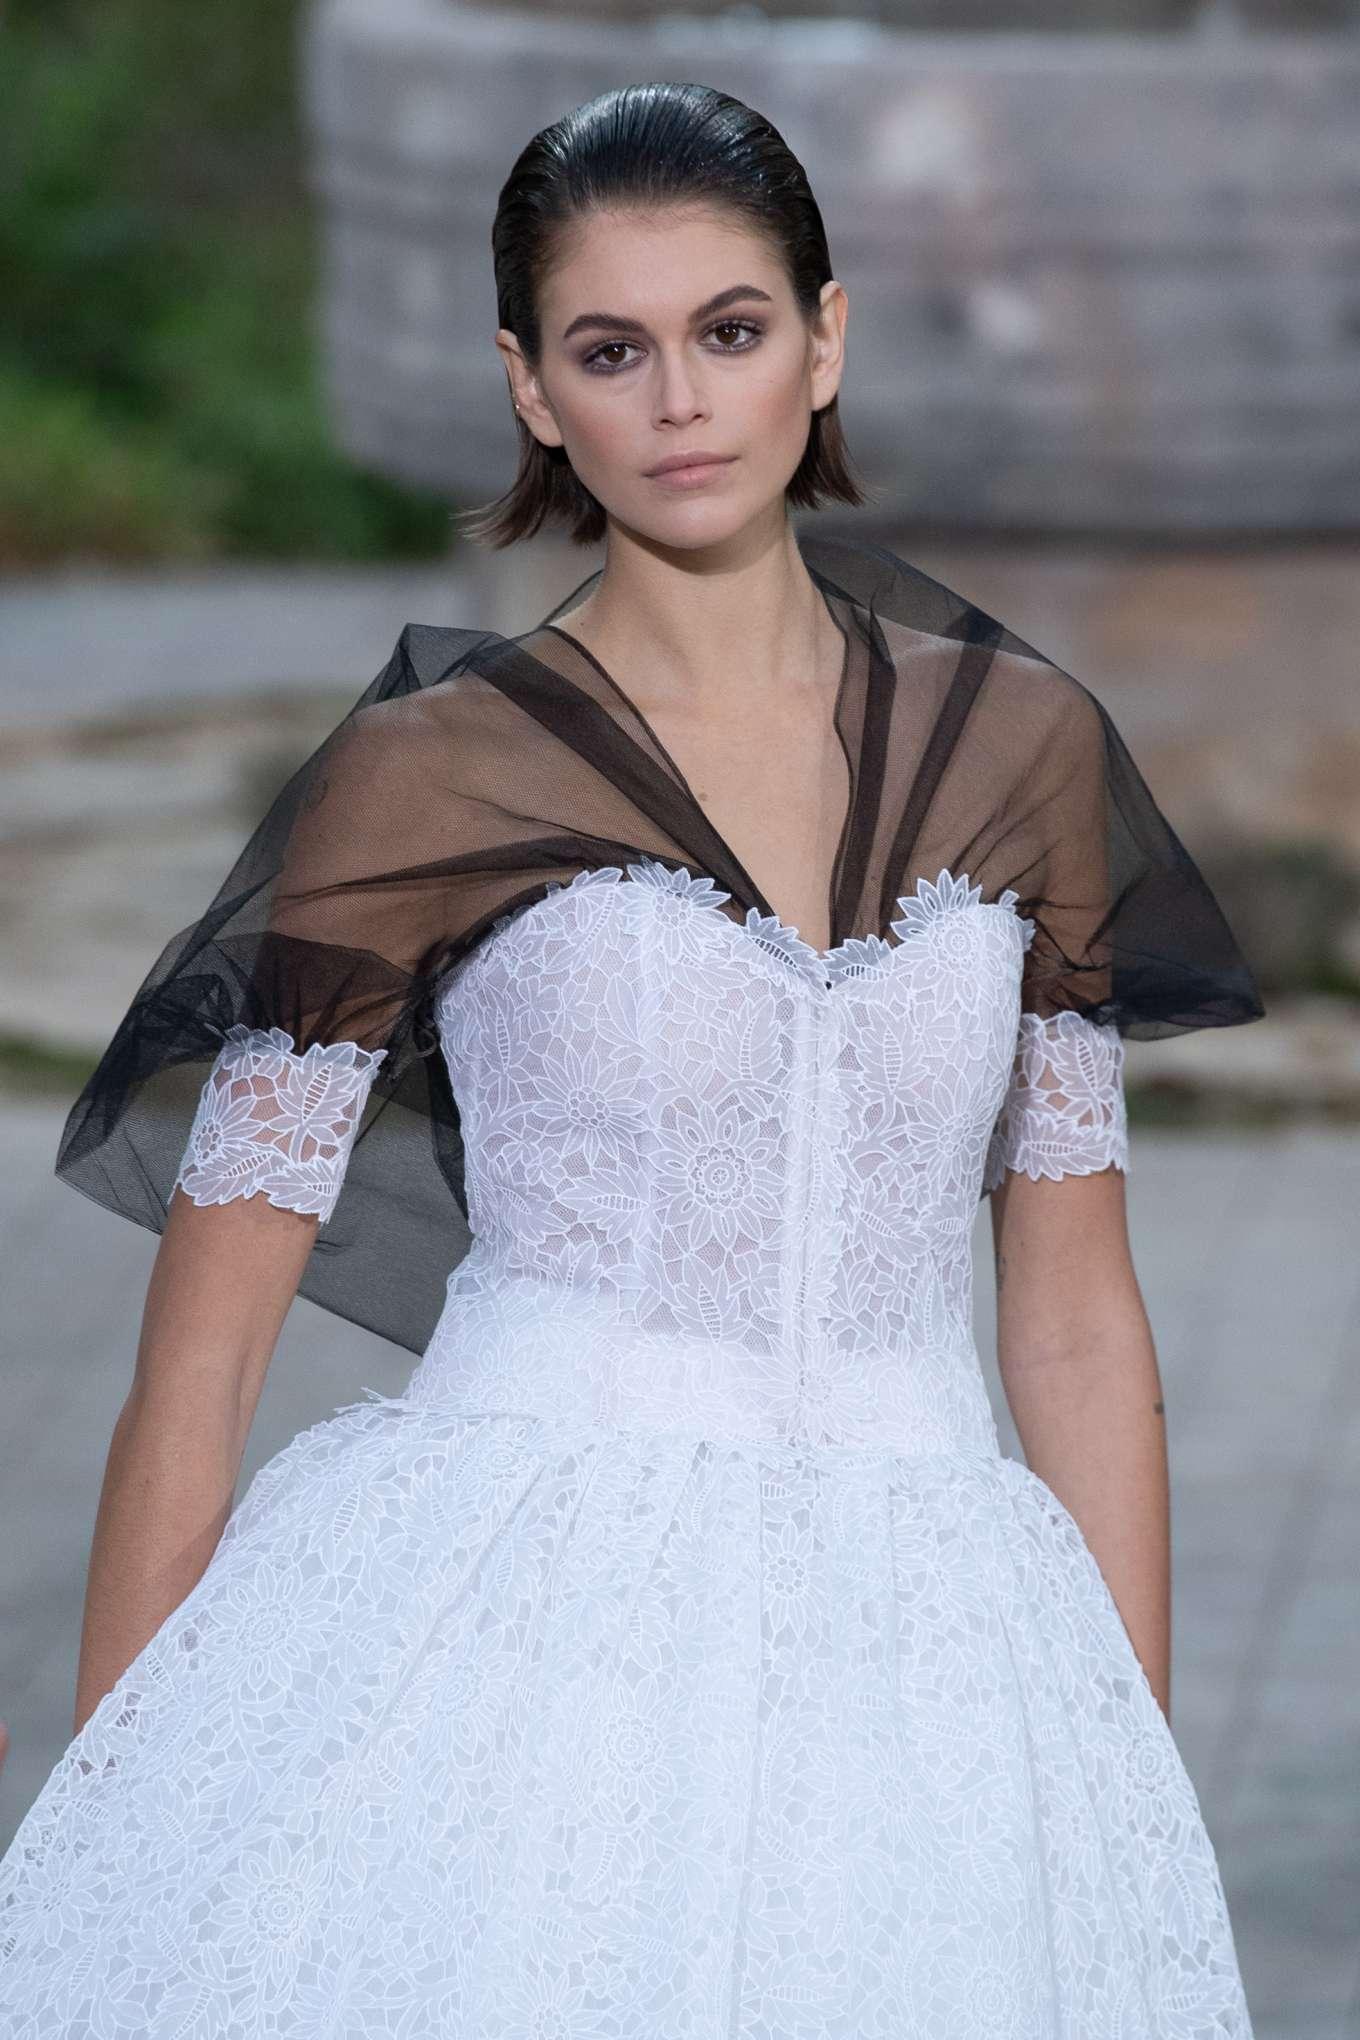 Kaia Gerber - Chanel Haute Couture Runway Show in Paris